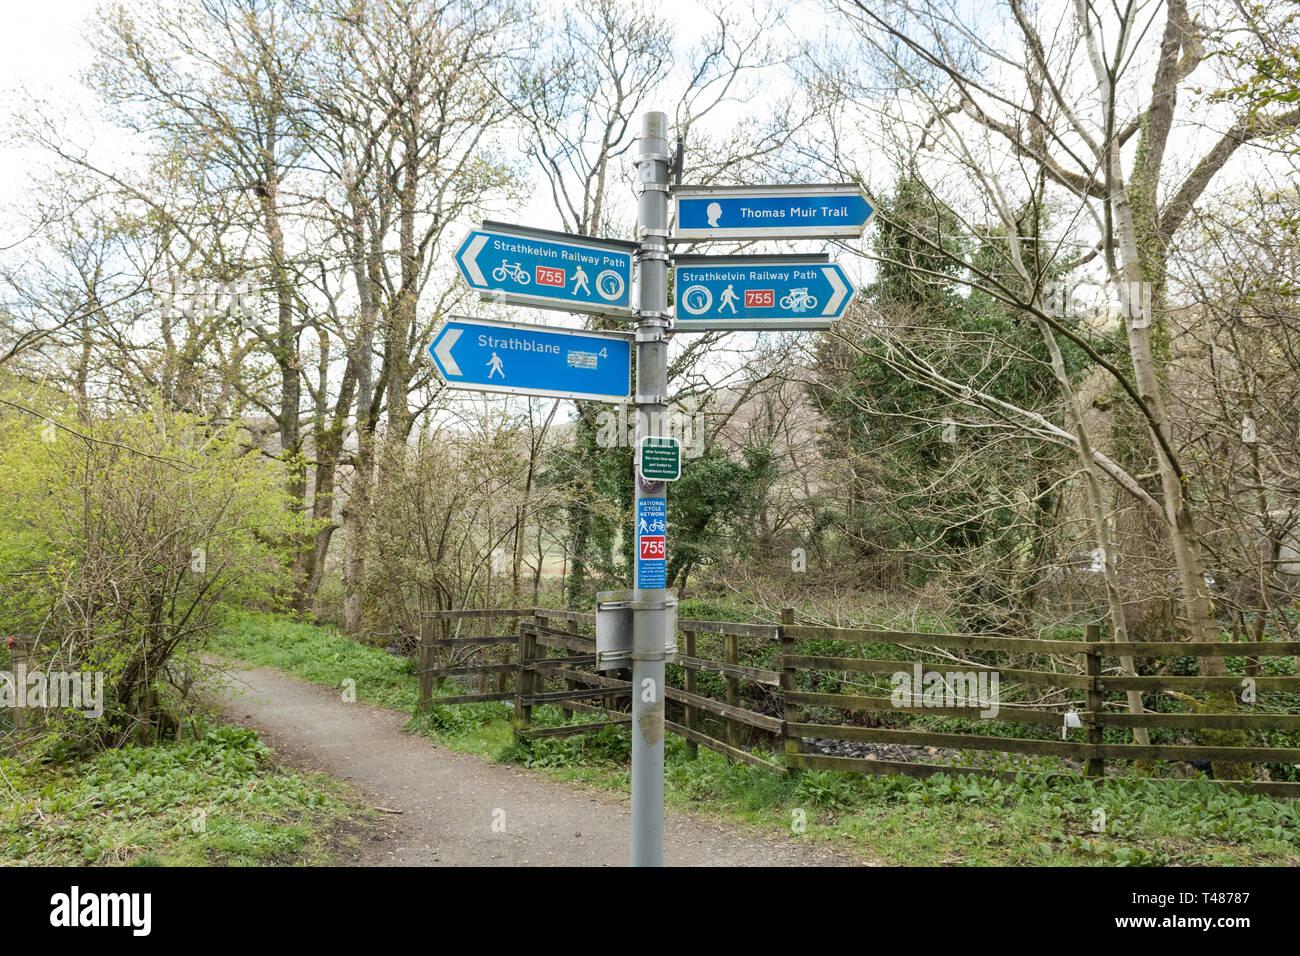 Strathkelvin Railway Path signpost between Campsie Glen and Strathblane - cycle route 755, John Muir Way, Thomas Muir Trail, Scotland, UK Stock Photo